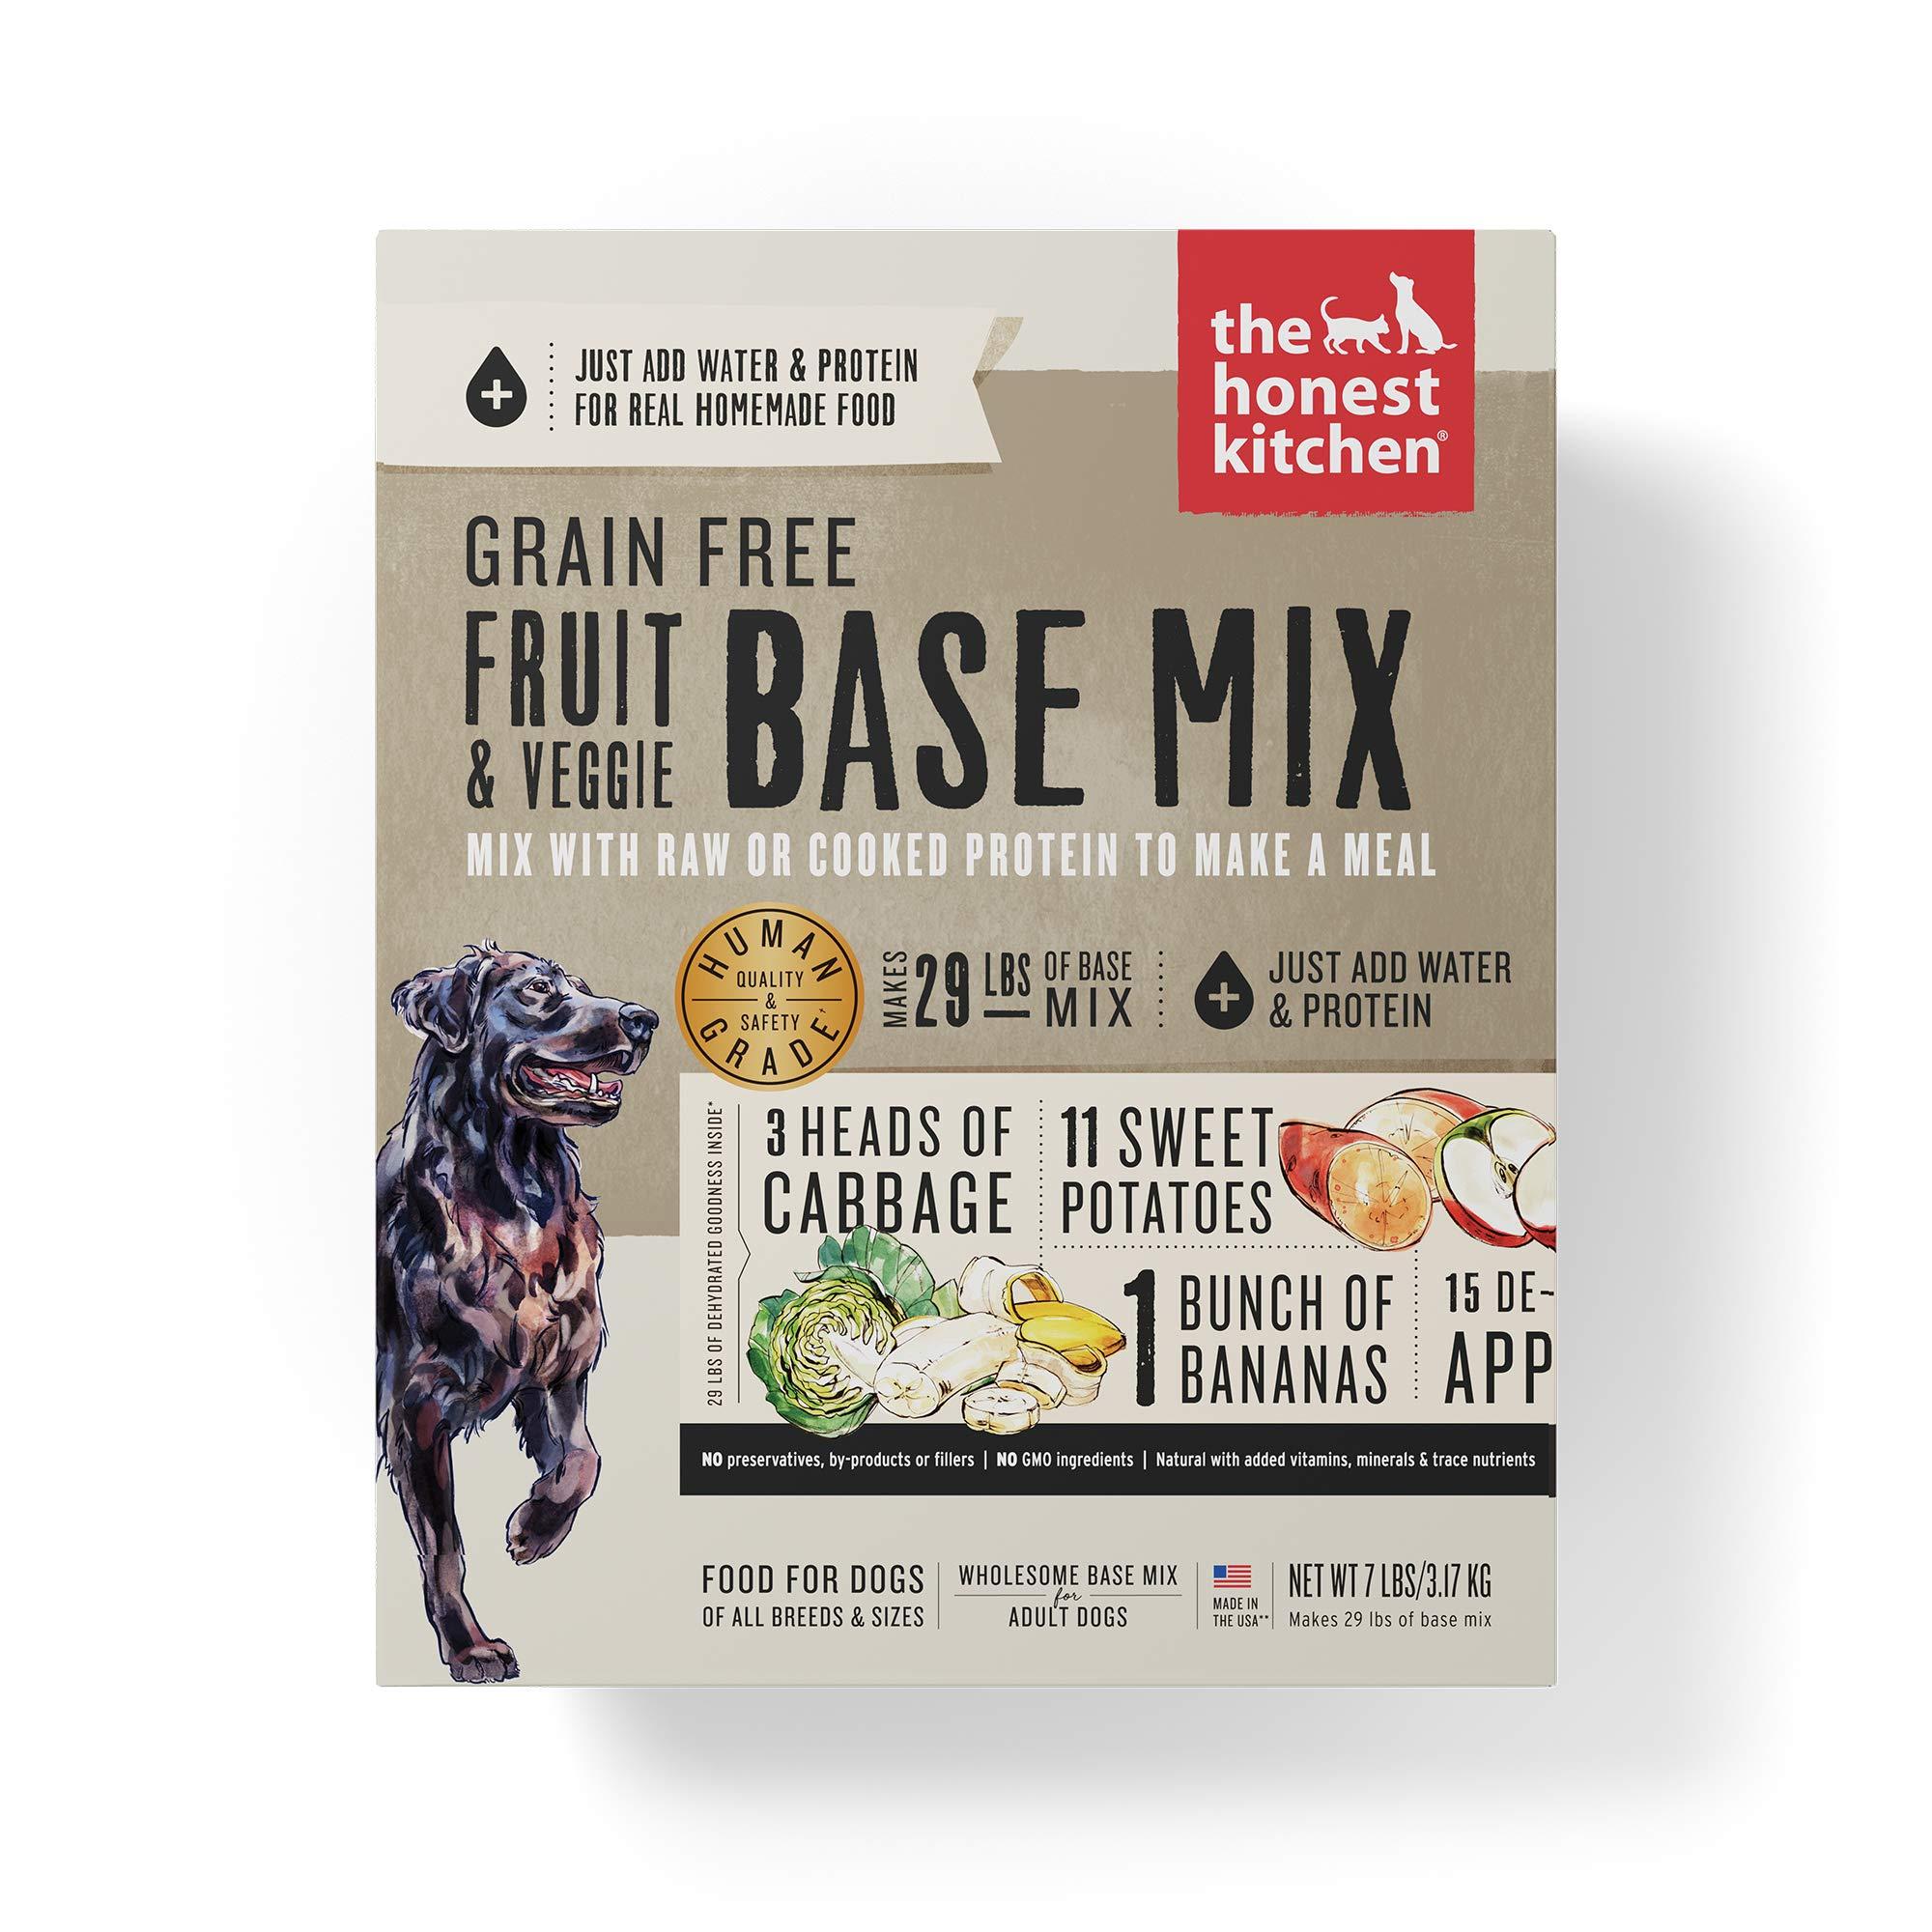 The Honest Kitchen Grain Free Fruit & Veggie Base Mix Recipe for Dogs, 7lb box by Honest Kitchen